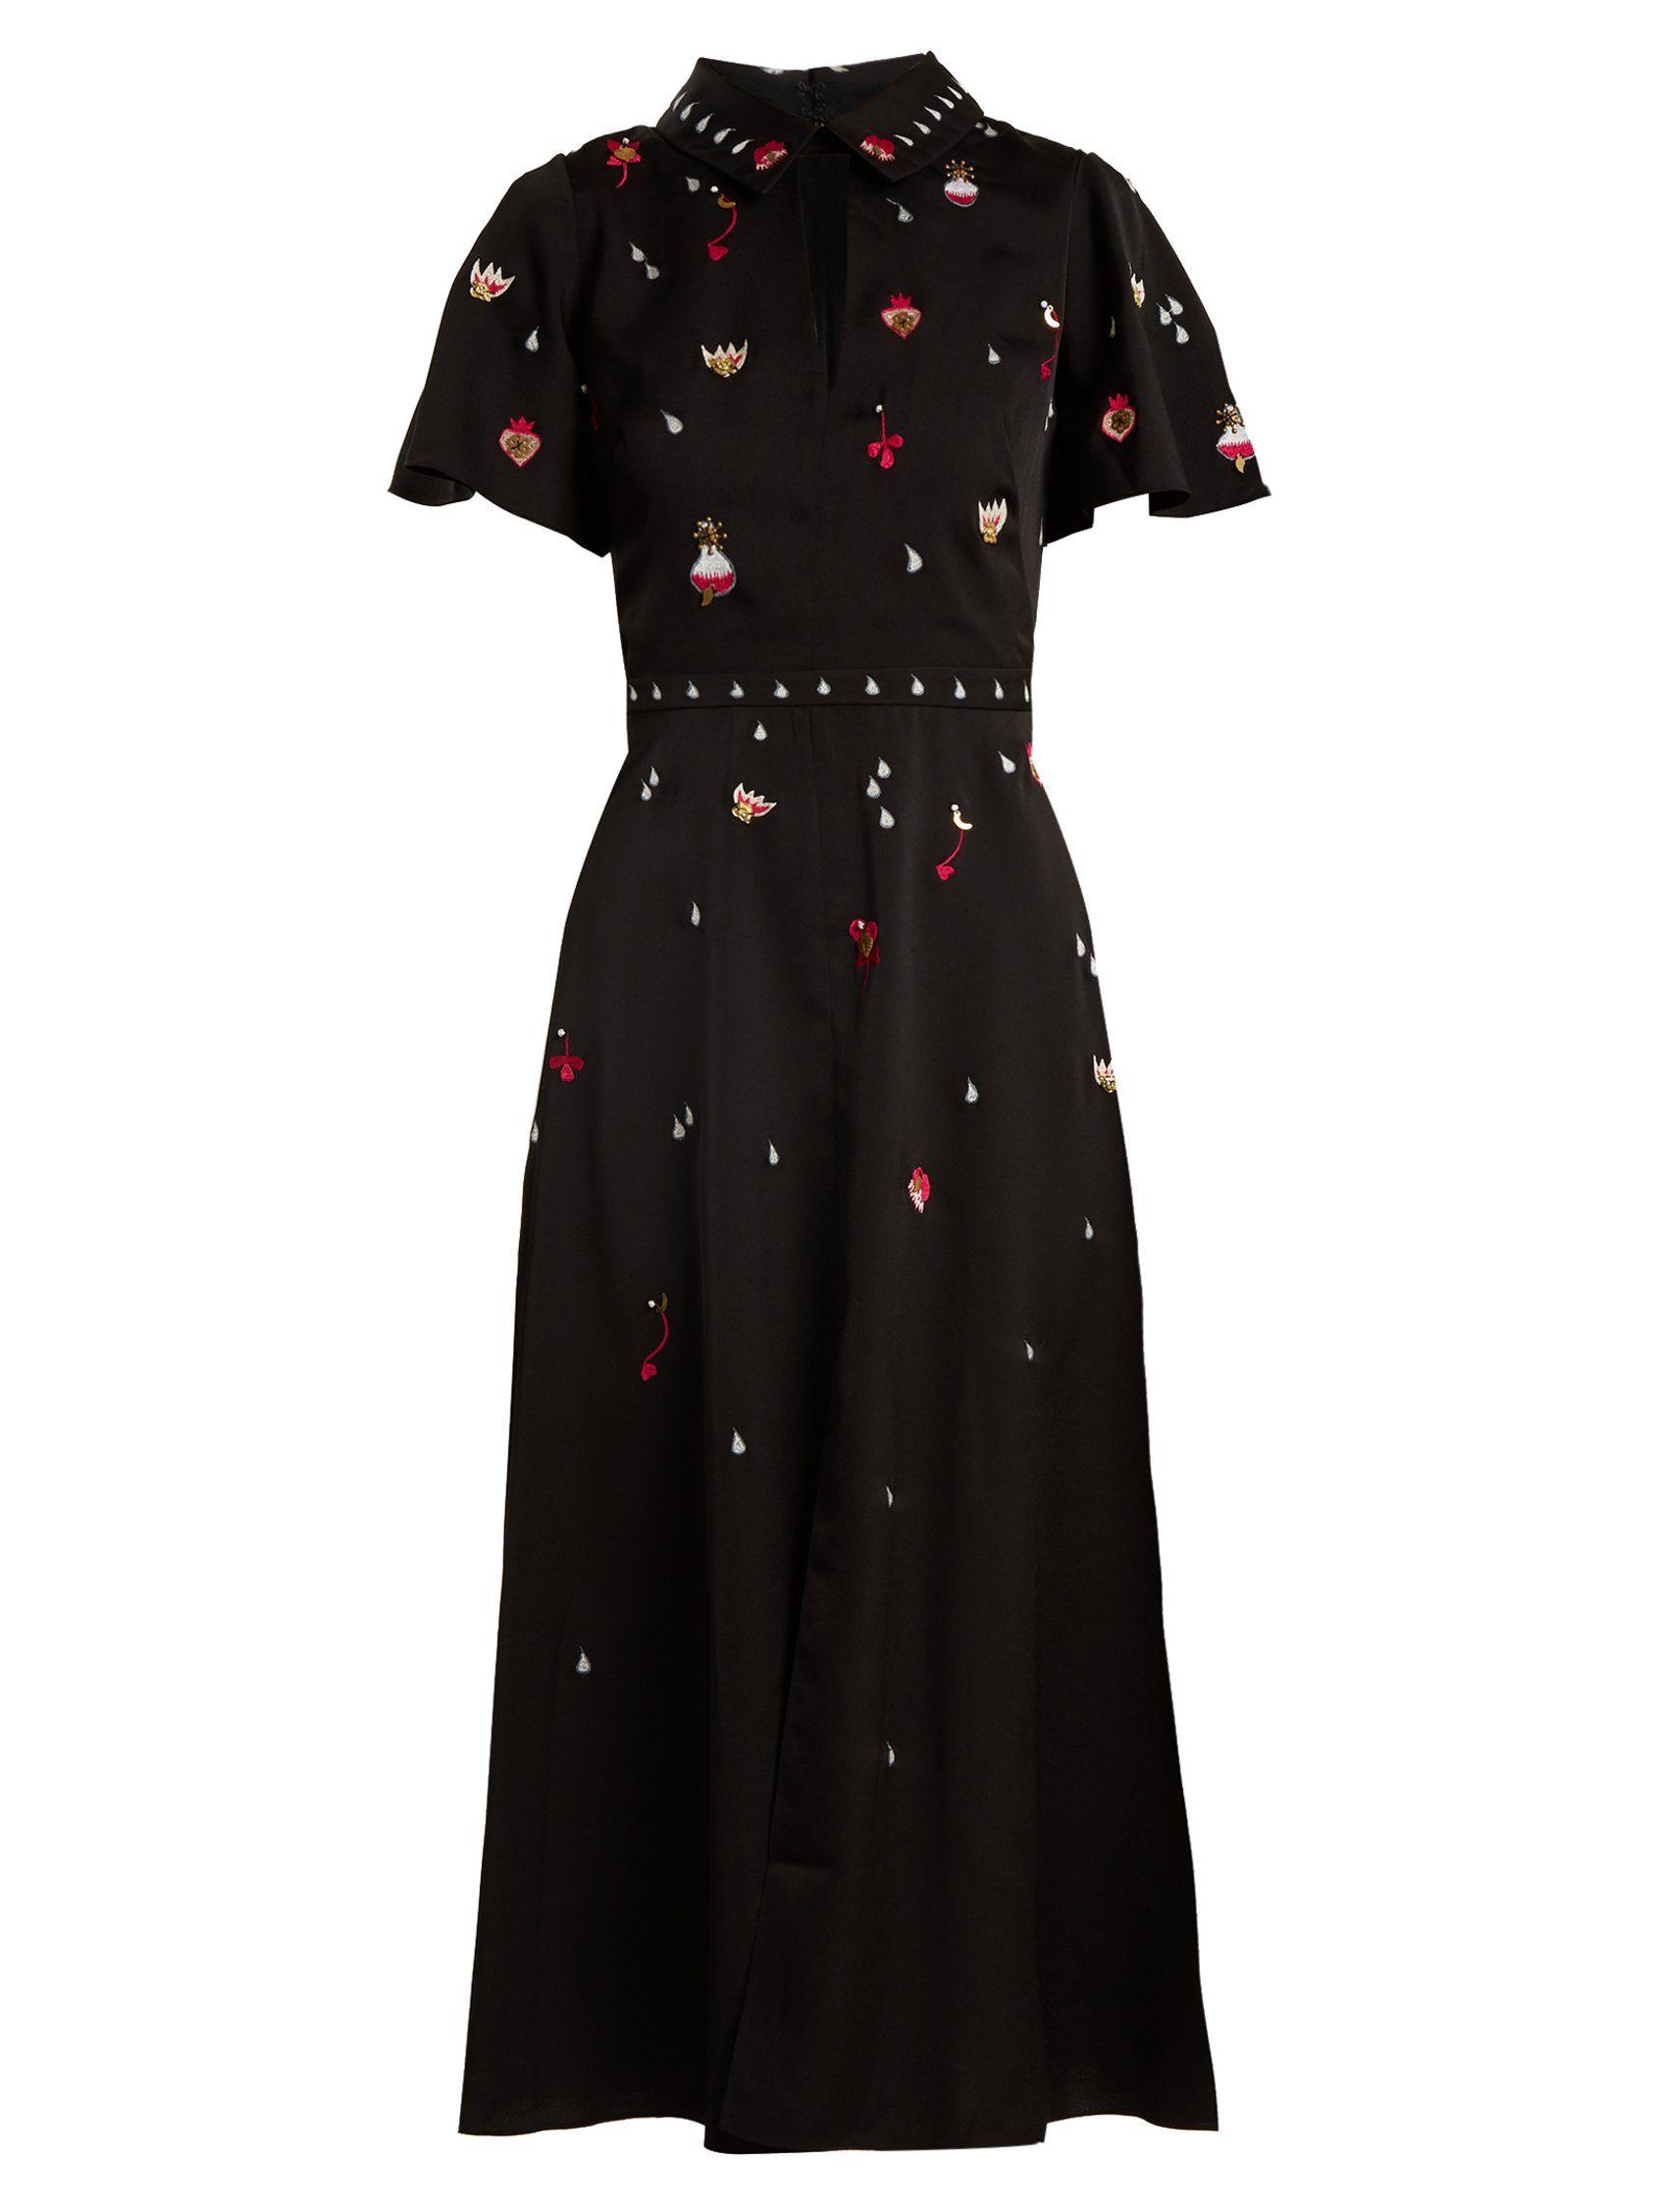 Saturn charm-embellished satin-cady midi dress Temperley London 2JkREWTz